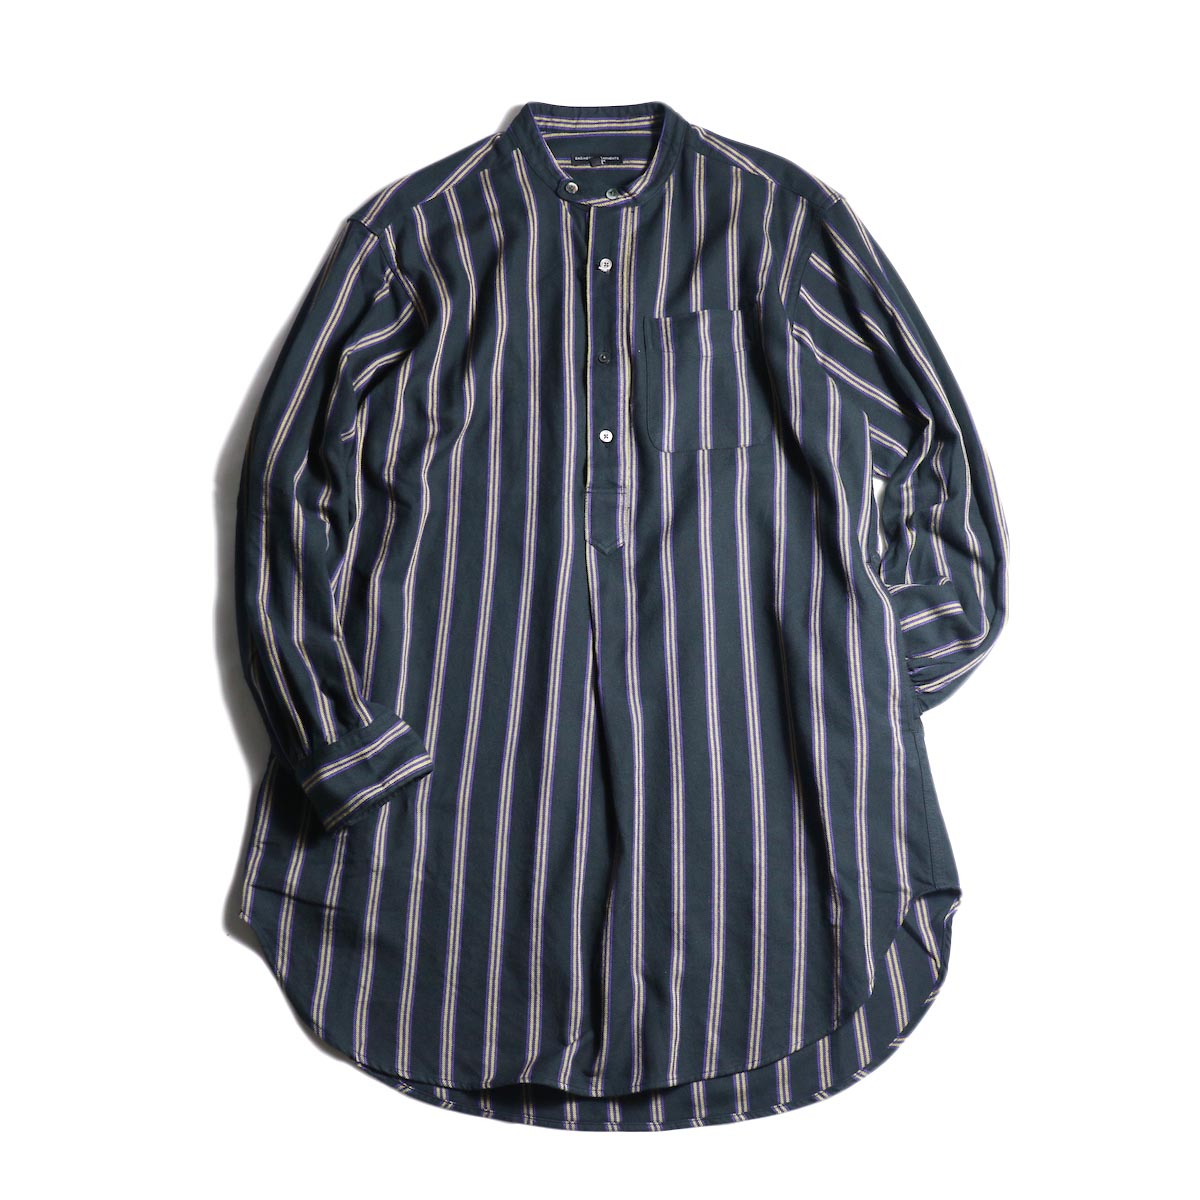 Engineered Garments / Banded Collar Long Shirt -Regent St. (Black)